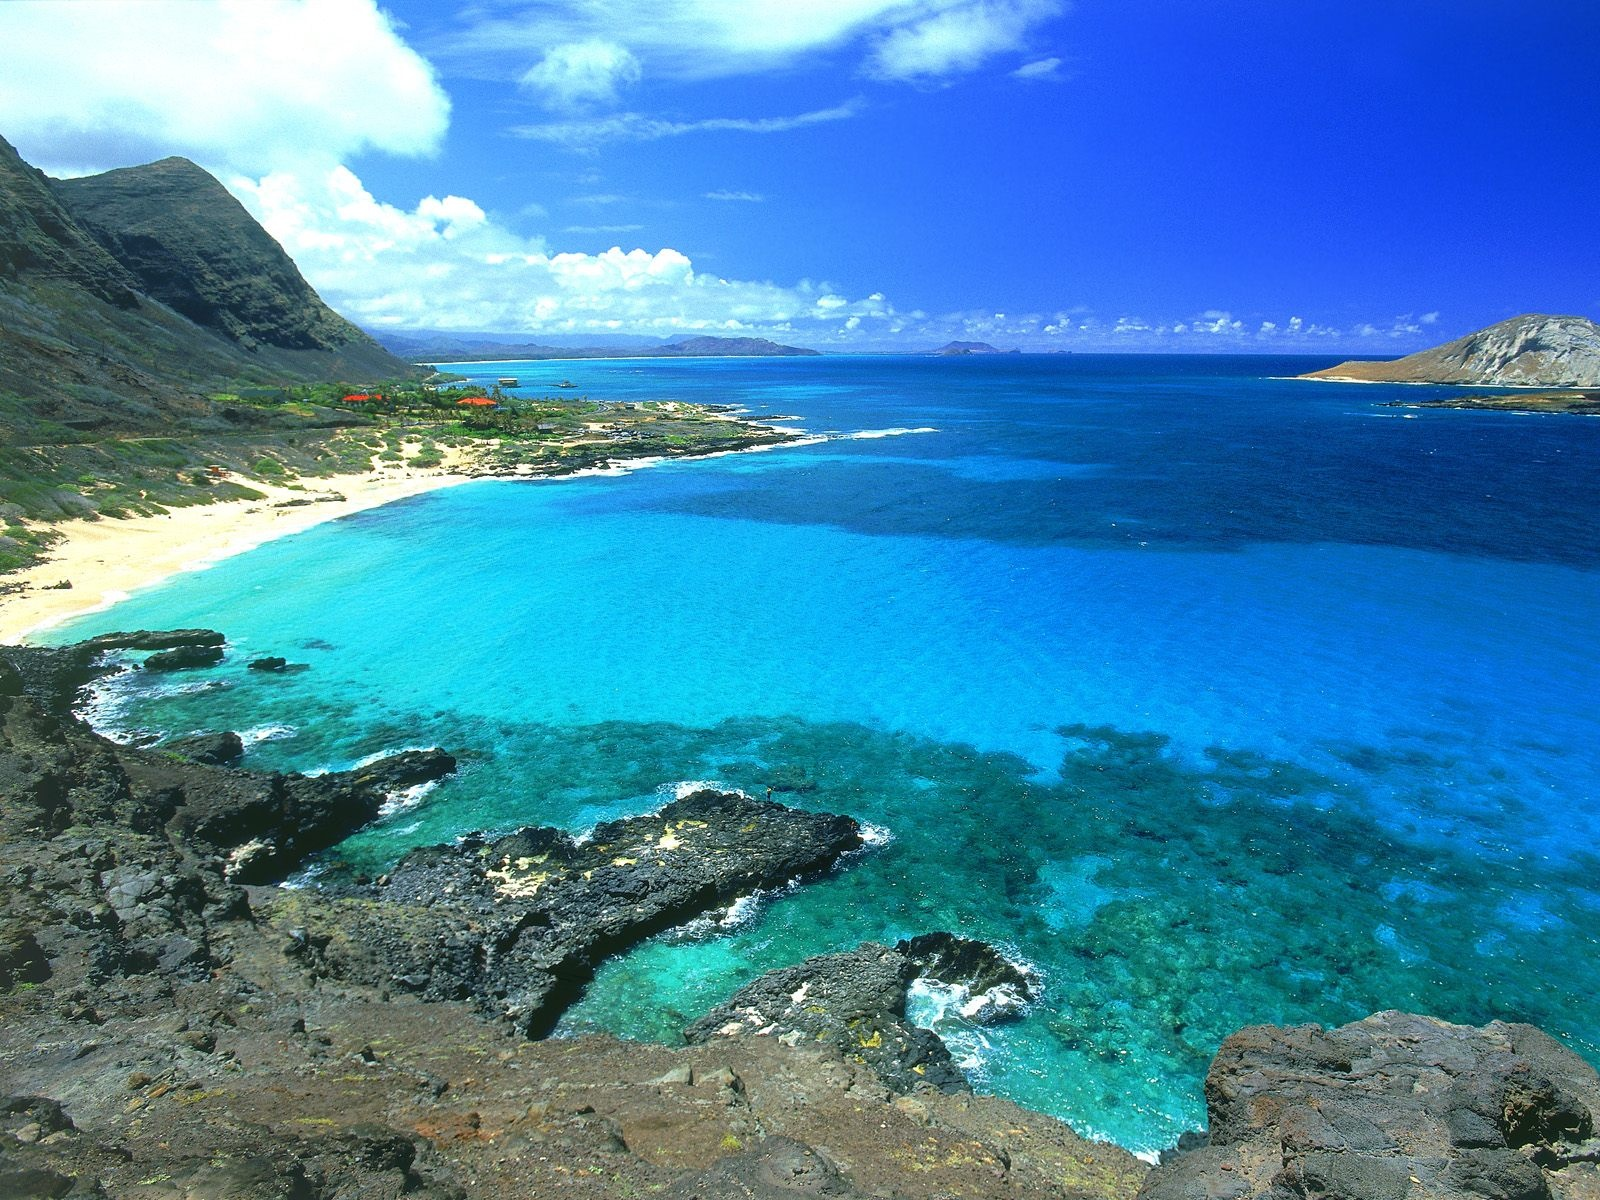 HD Wallpapers Beach Beautiful - Amazing Makapuu Hawaii